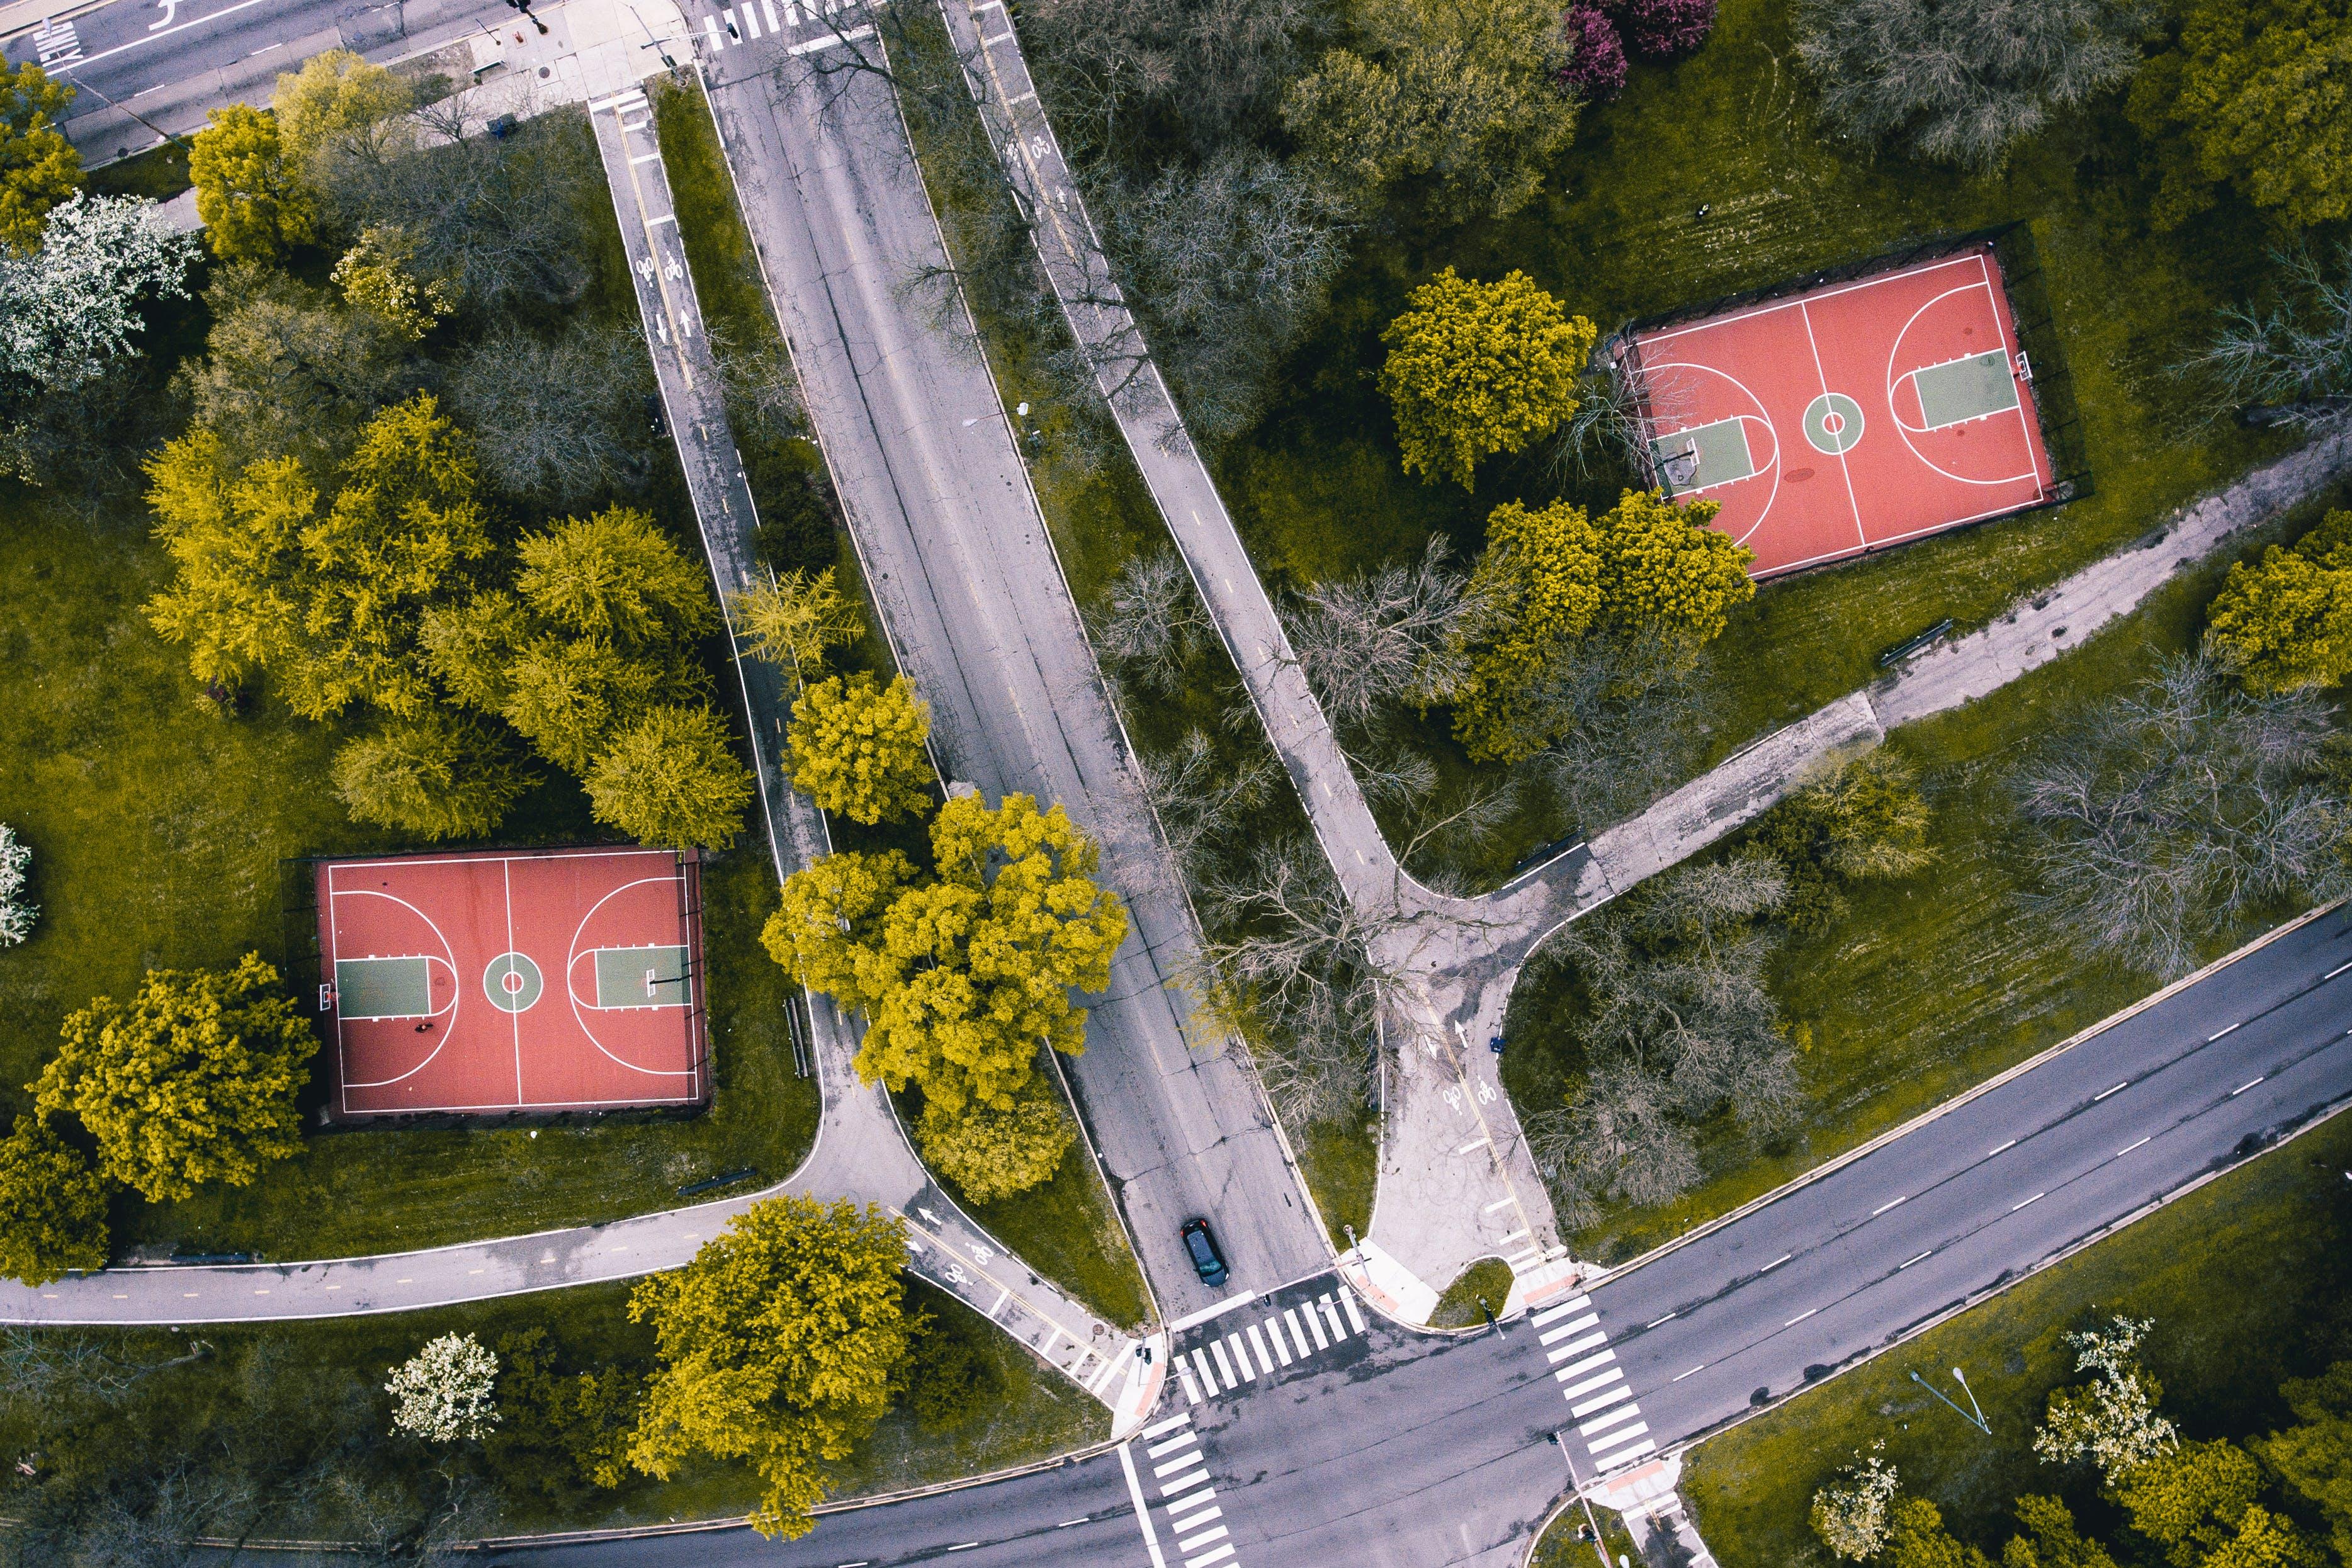 Kostenloses Stock Foto zu basketball, basketball platz, bäume, draußen